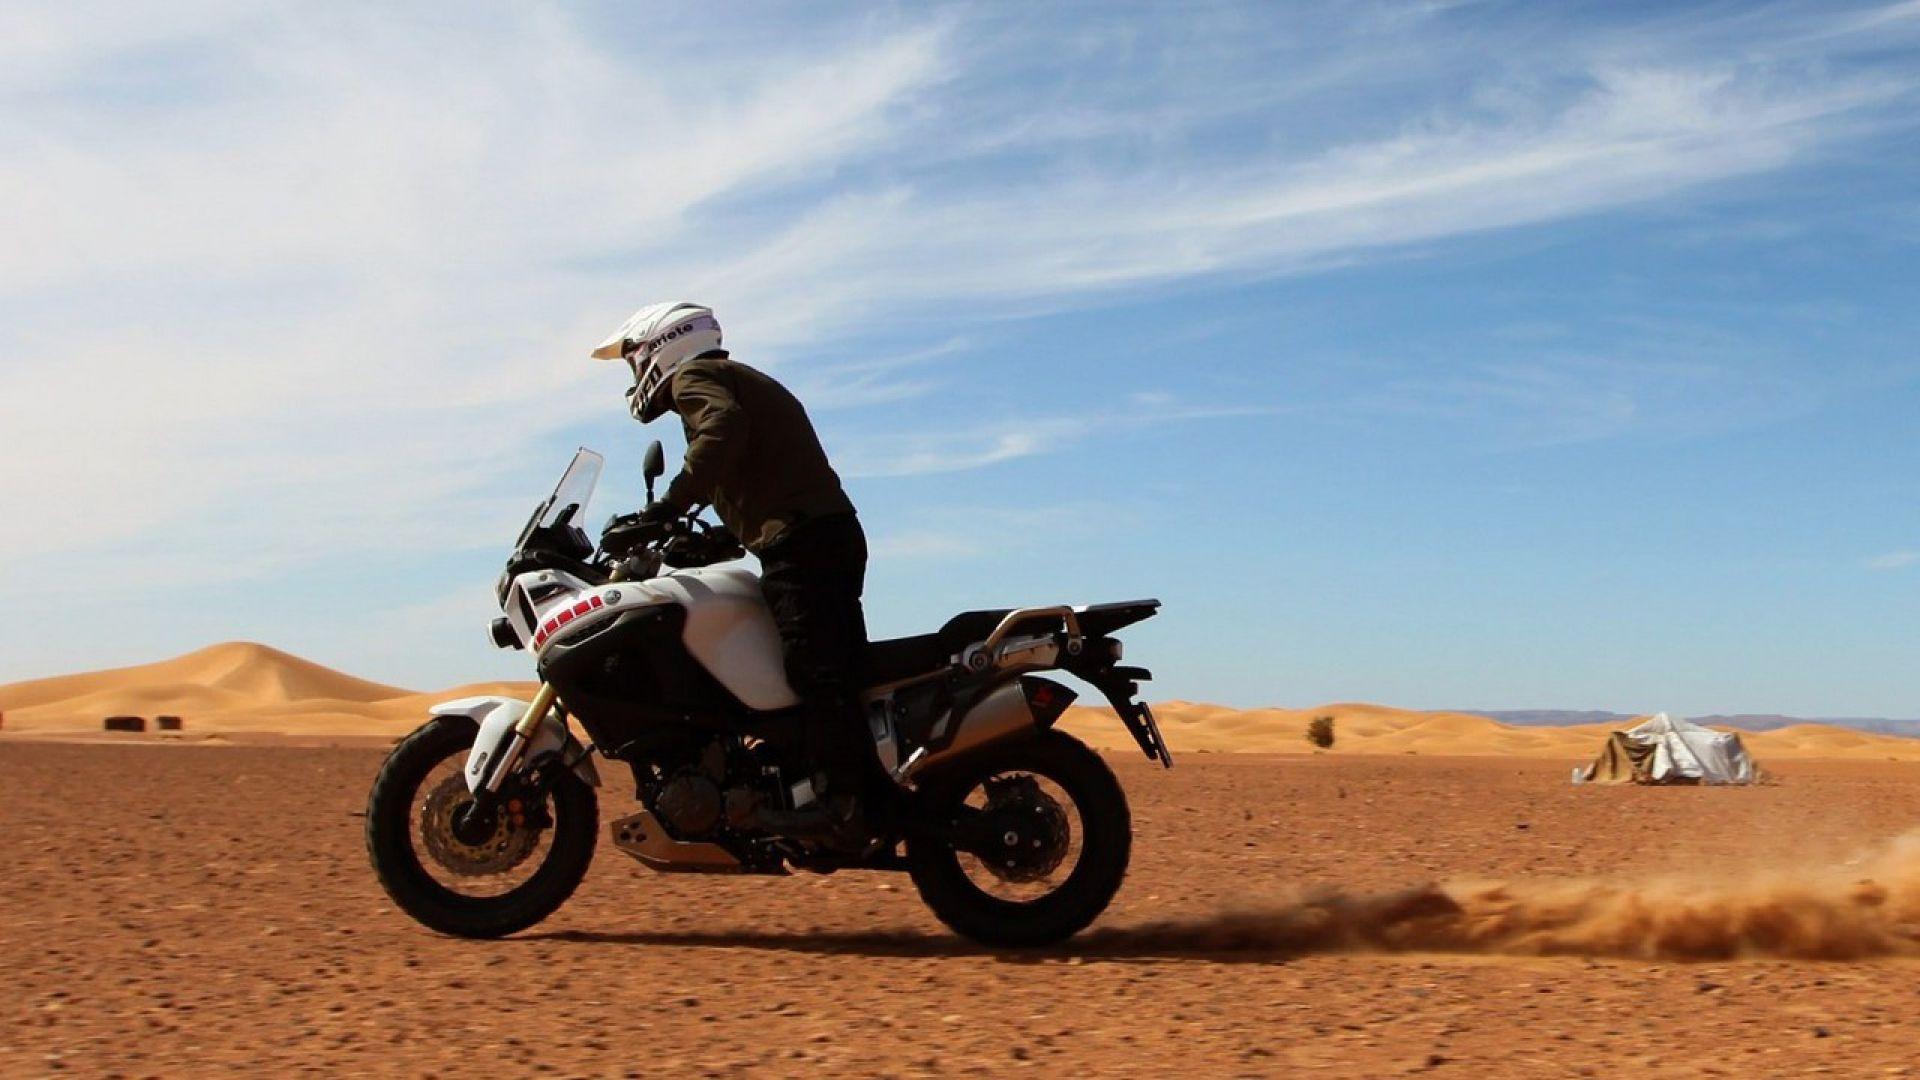 Immagine 102: In Marocco con la Yamaha Super Ténéré